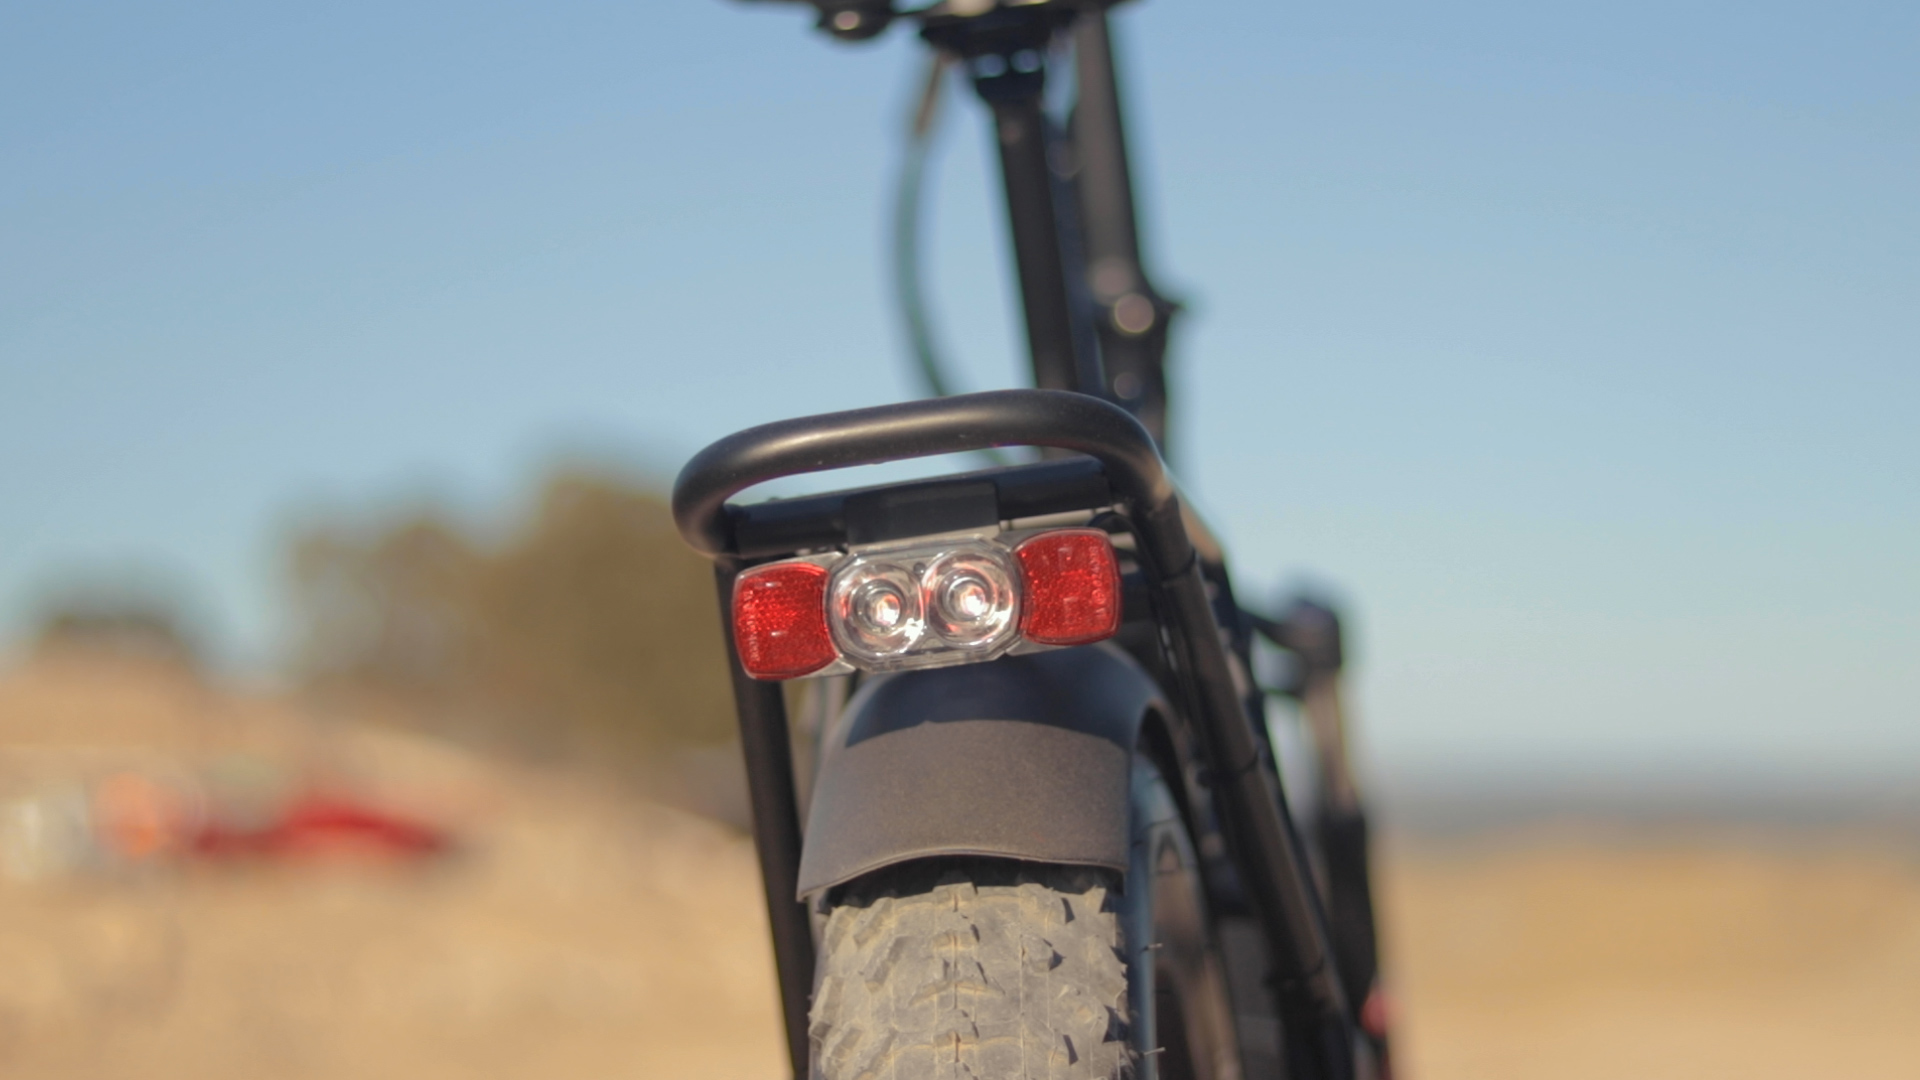 electrified-reviews-bagibike-b20-premium-electric-bike-review-tail-light.jpg